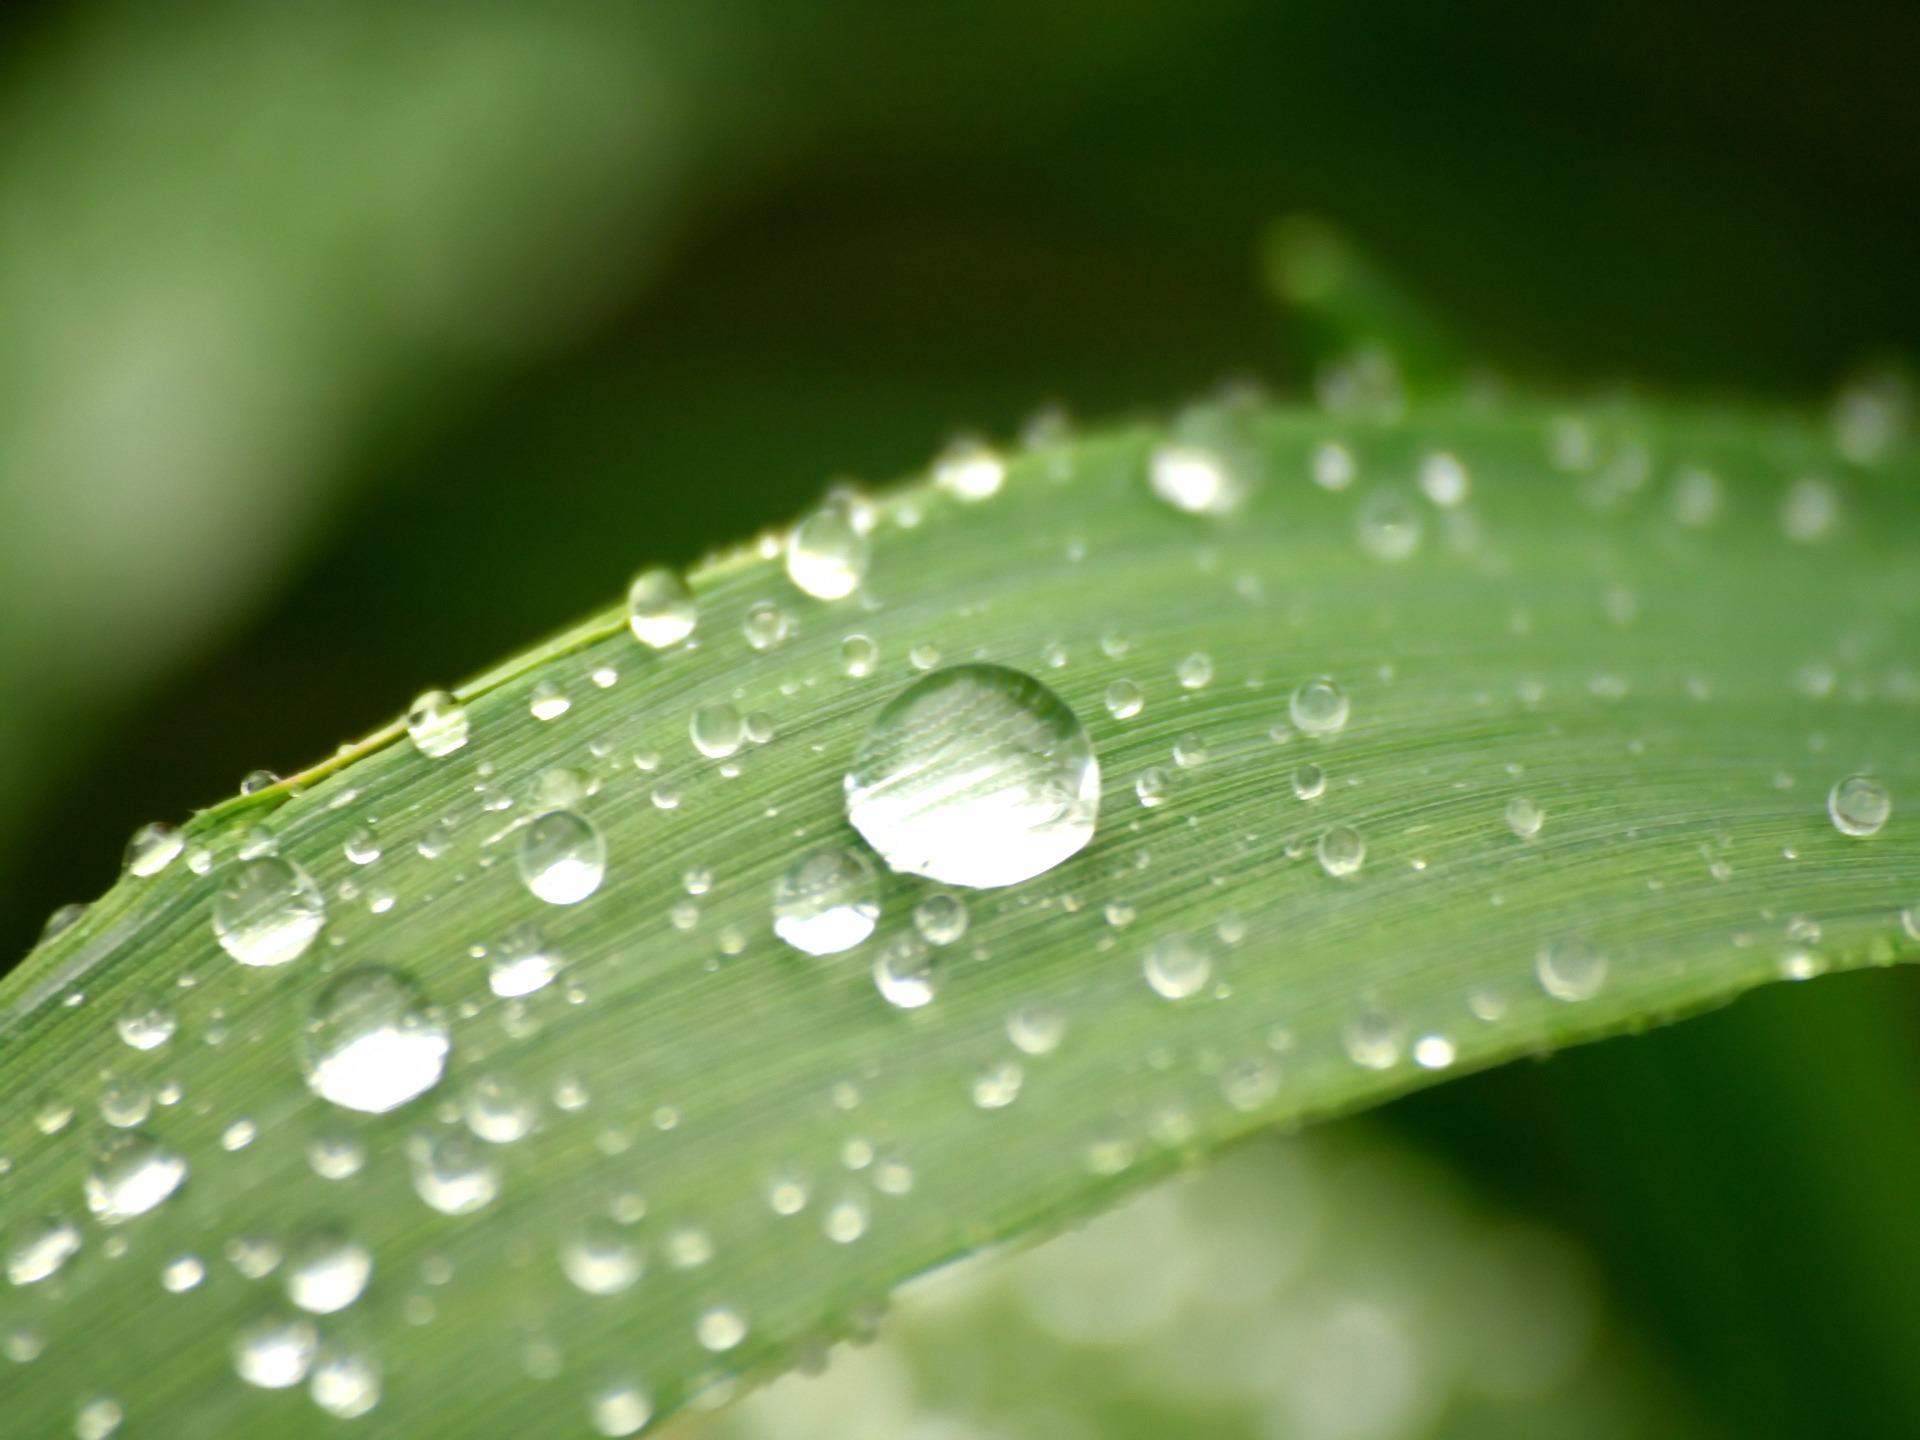 3d Wallpaper Water Drop Leaf Drops Wallpaper Plants Nature Wallpapers In Jpg